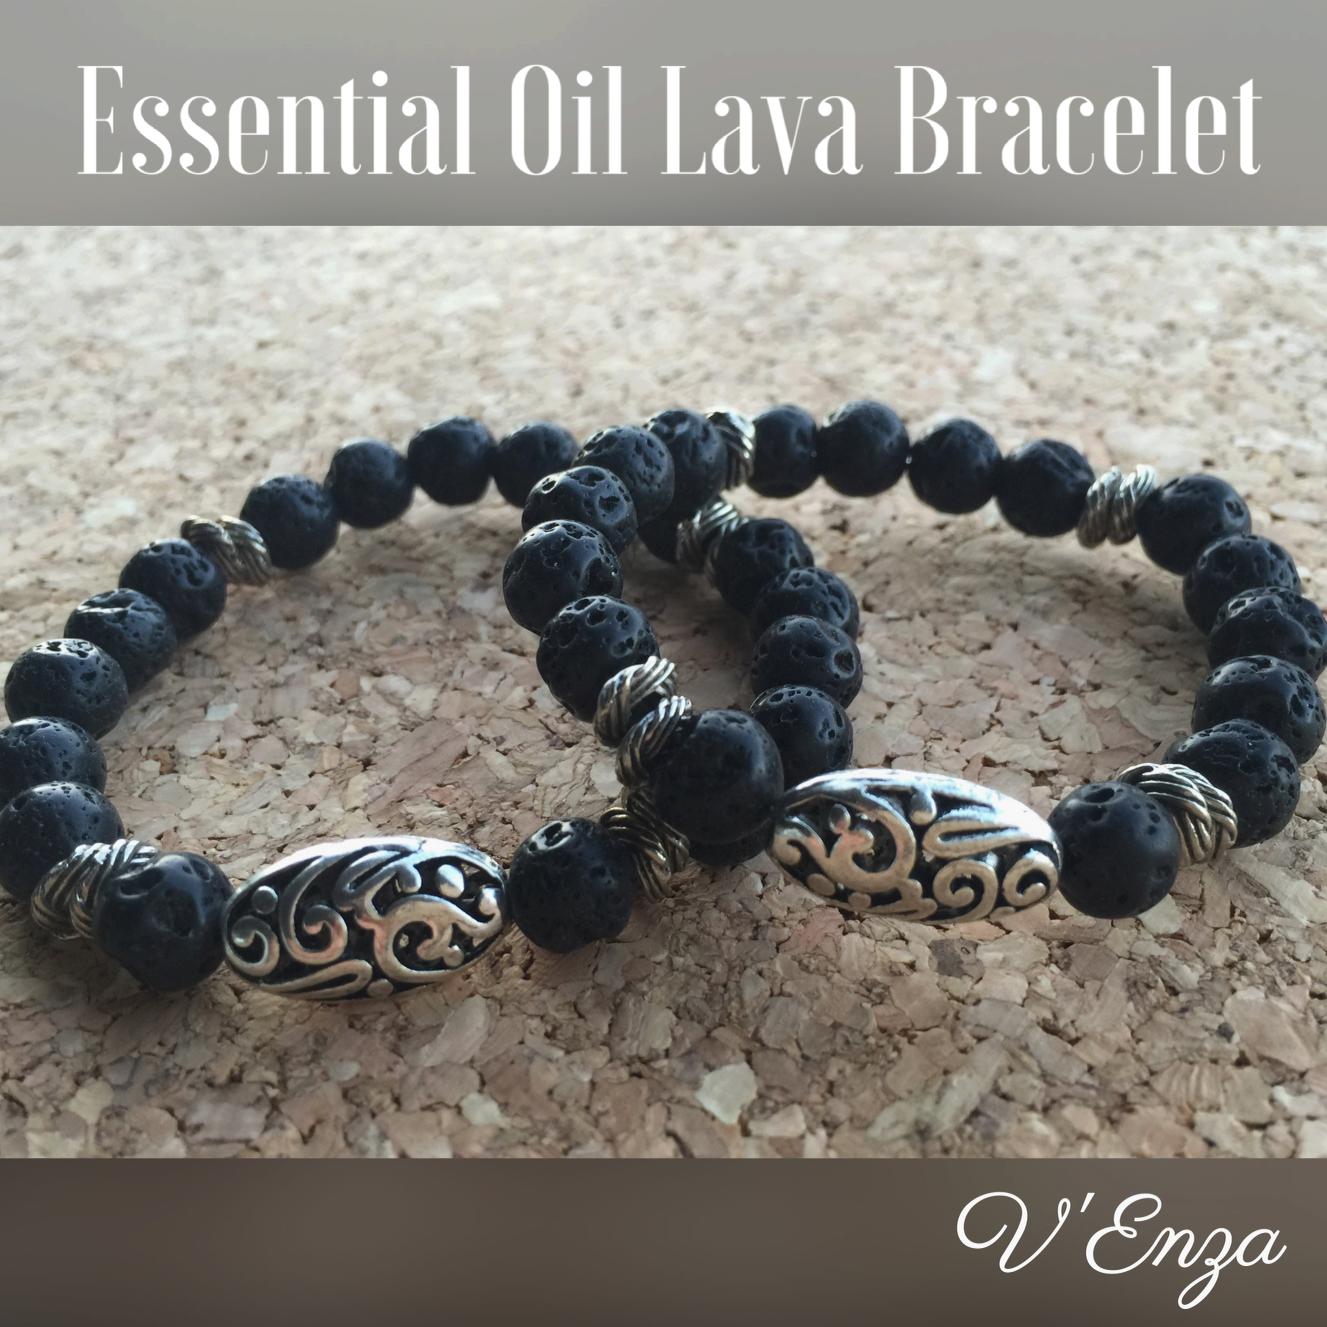 Essential Oil Lava Bracelet